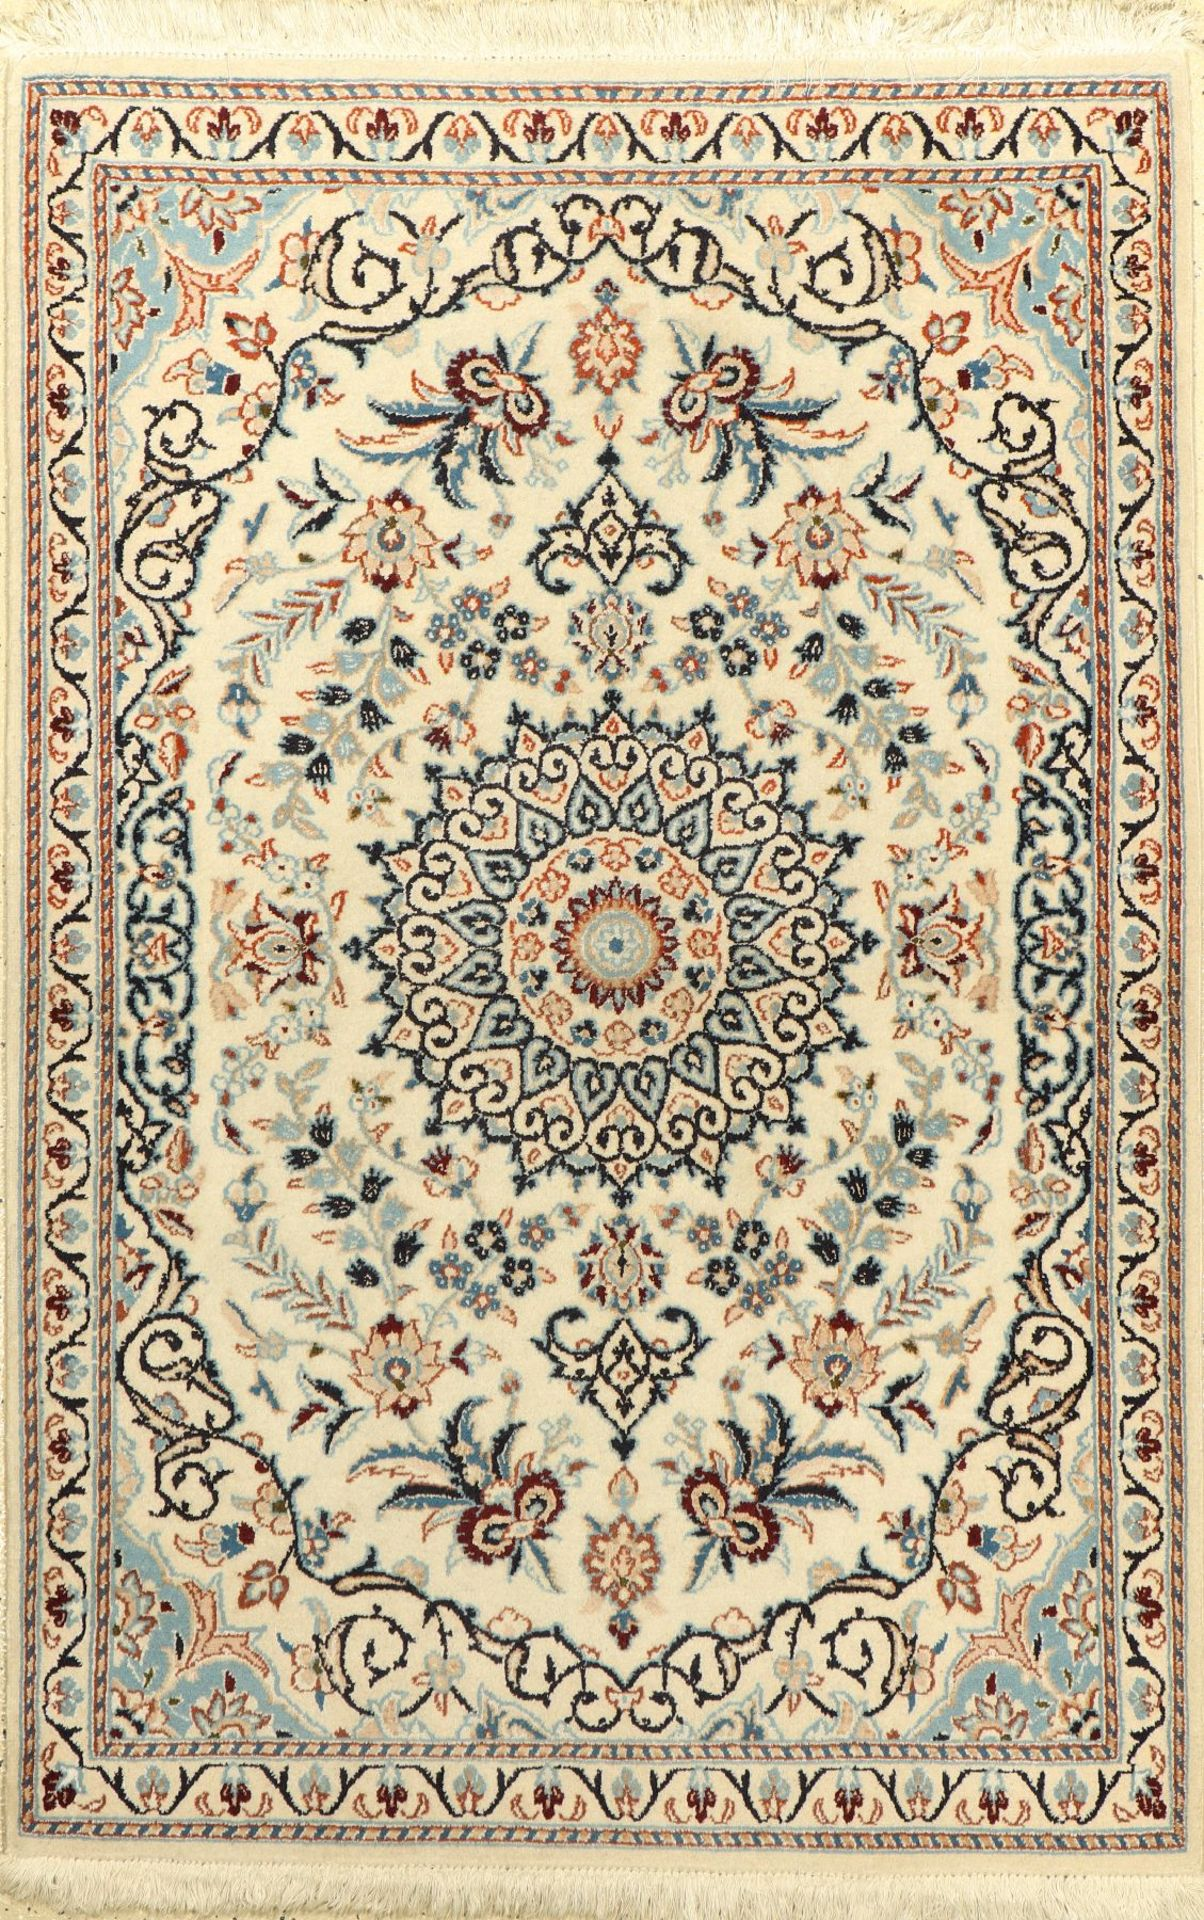 Nain, Persien, ca. 30 Jahre, Wolle auf Baumwolle, ca. 137 x 91 cm, EHZ: 2-3Nain Rug , Persia,